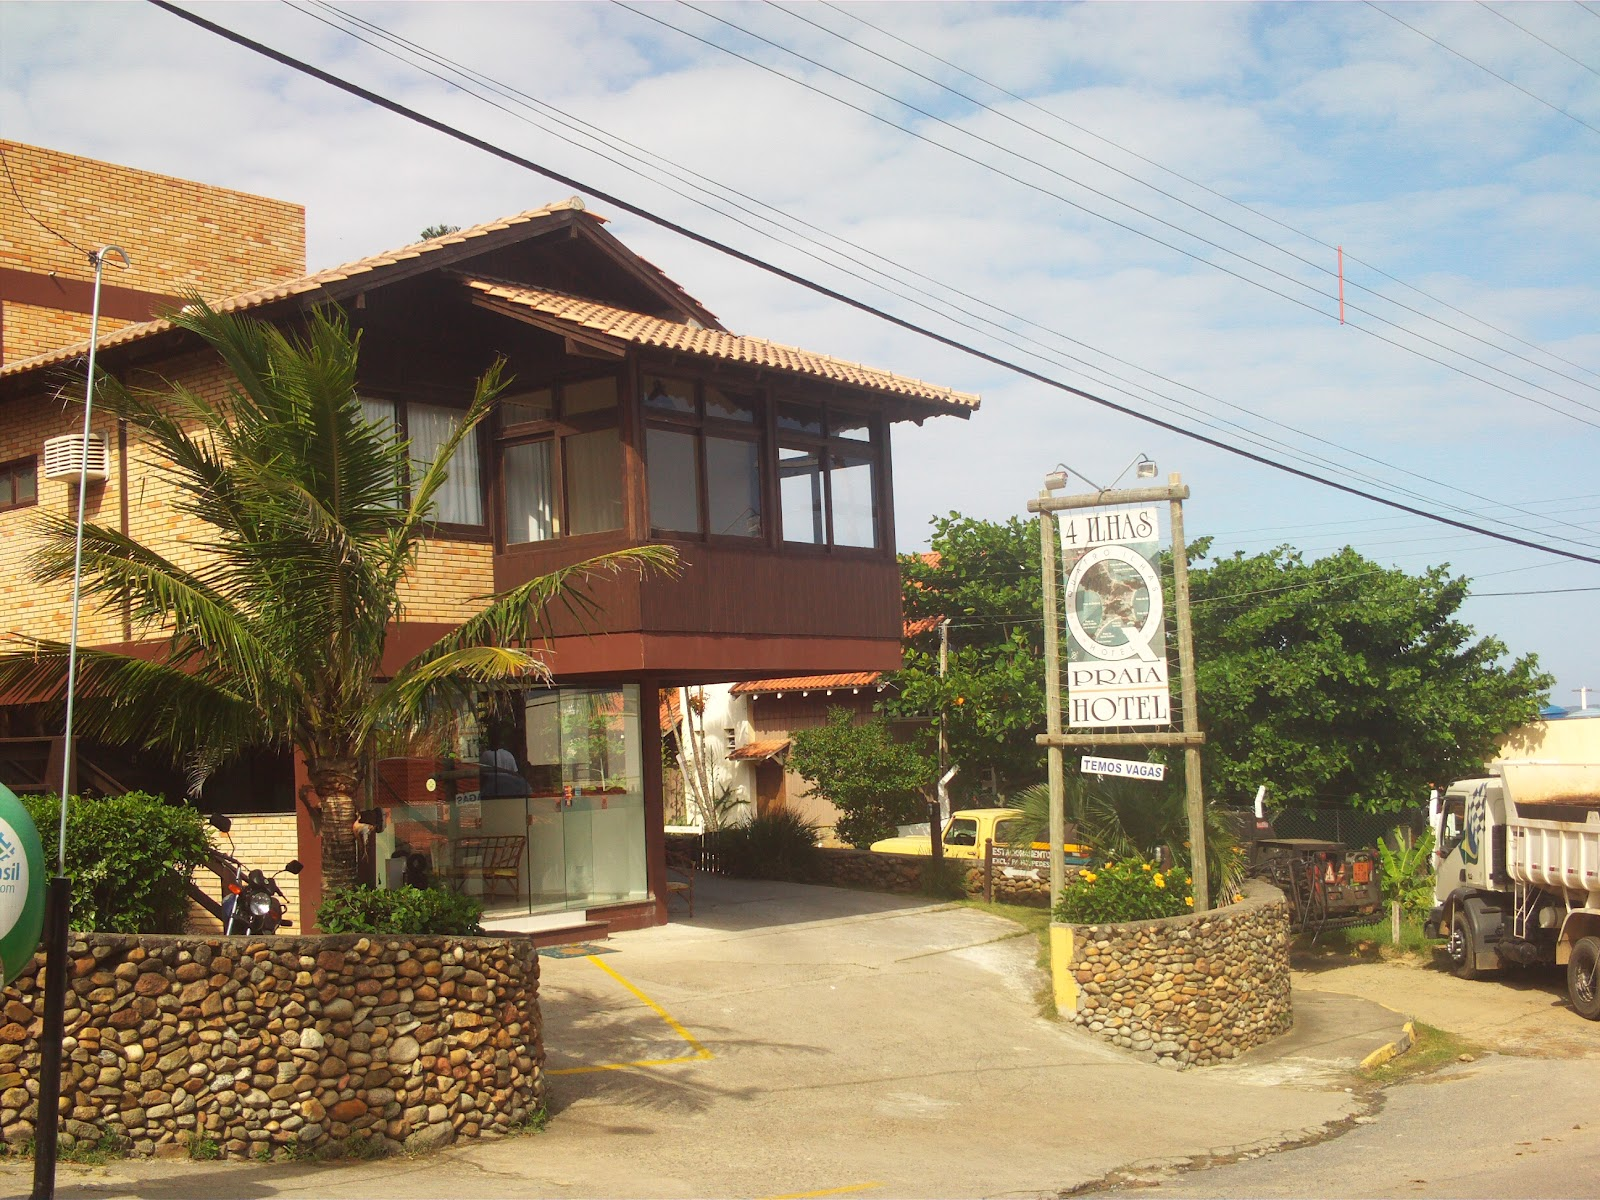 C digo b126 hotel en 4 ilhas playa de 4 ilhas hasta 4 for Gimnasio quatro